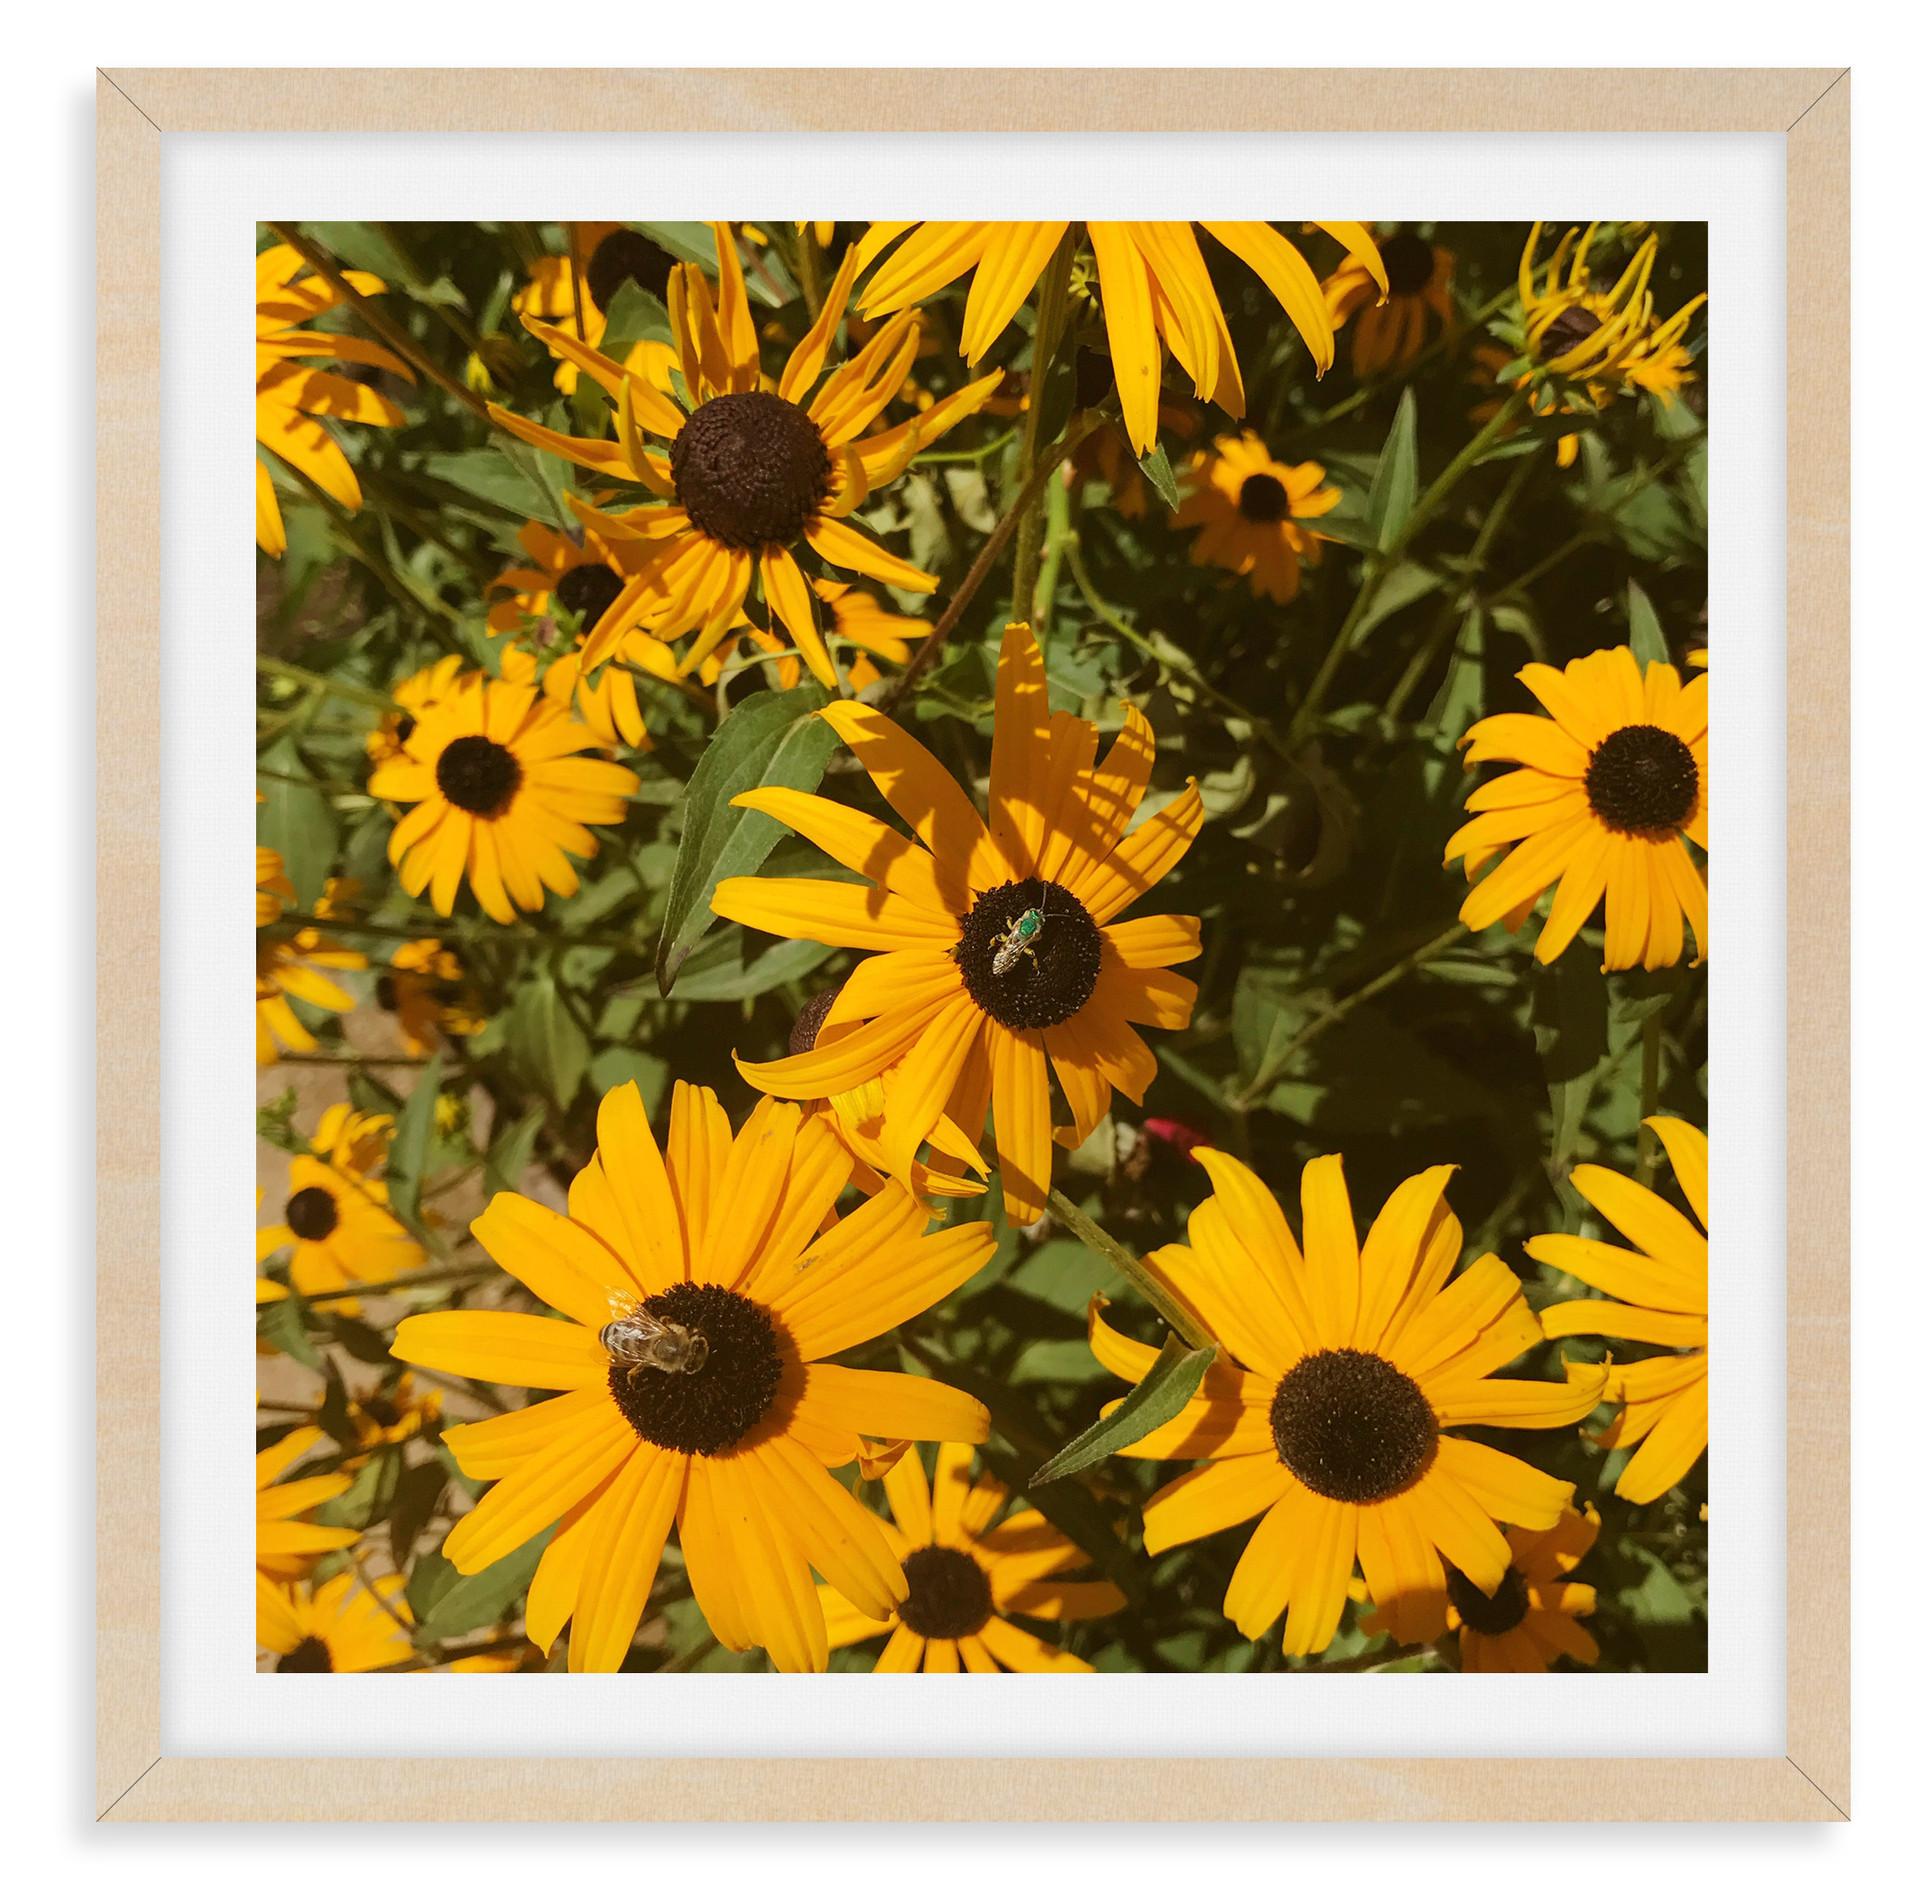 yellow daisies bees garden wall art leas